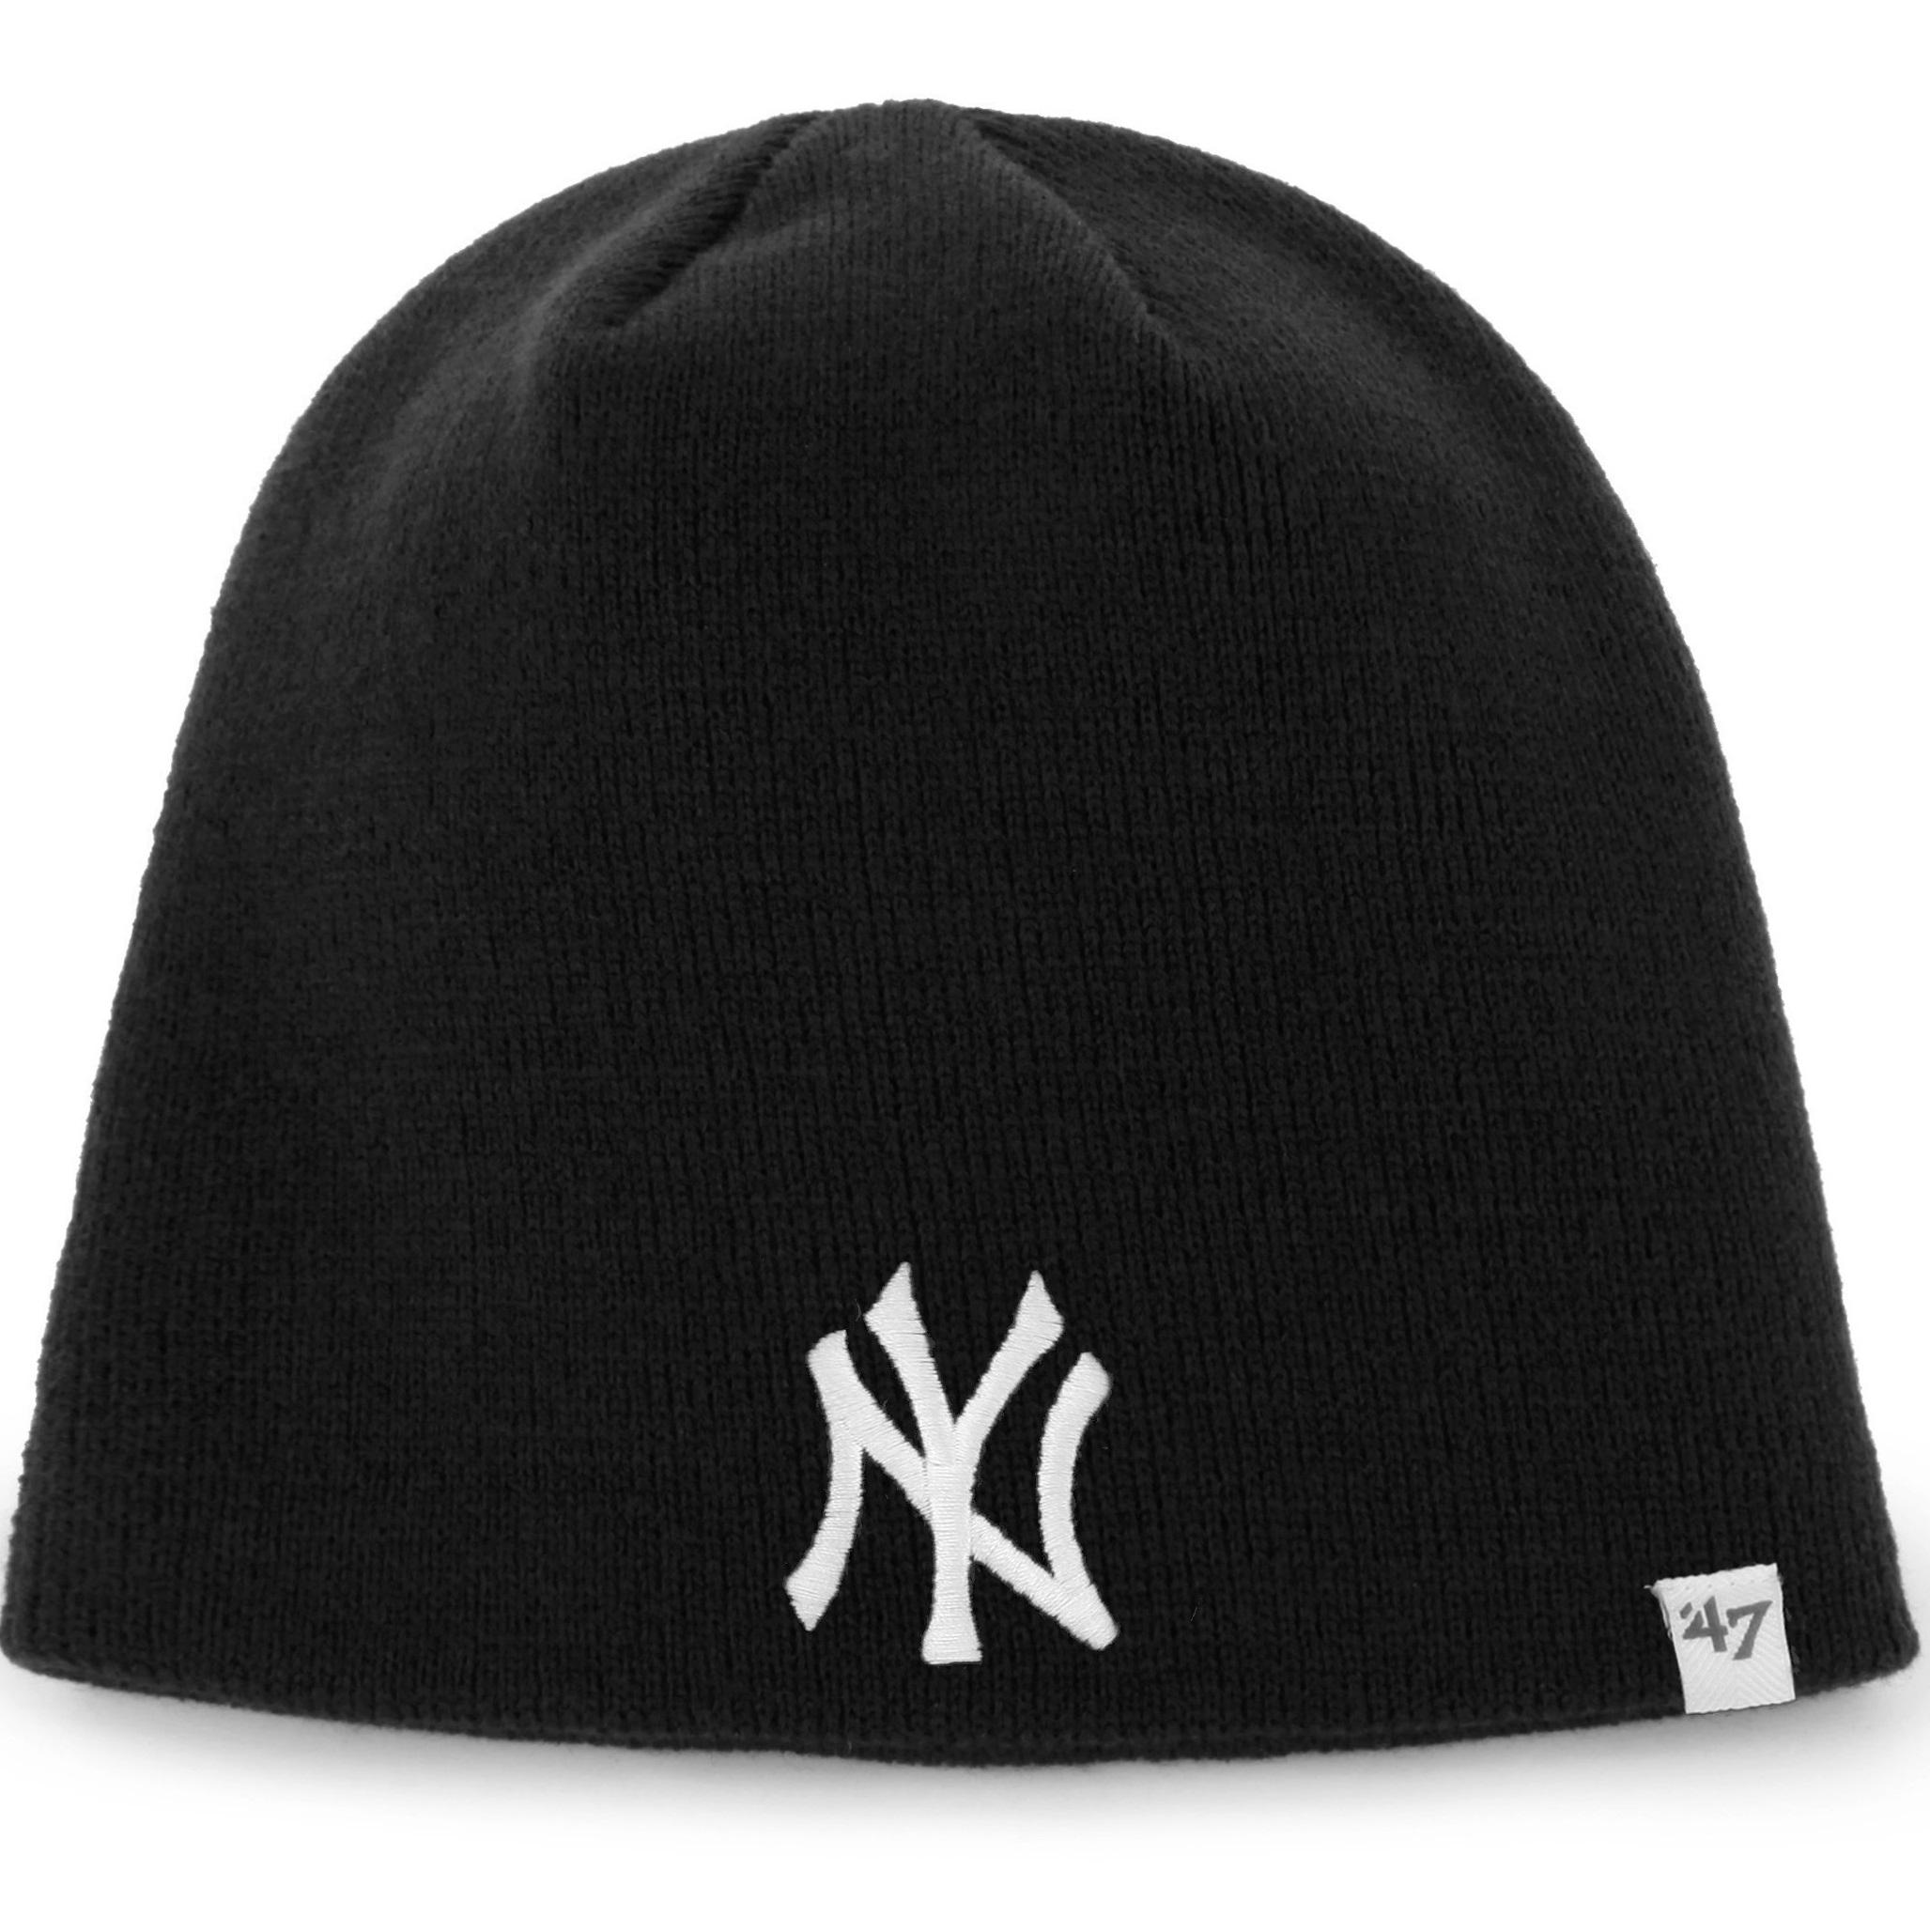 Amazon.com : '47 NFL Arizona Cardinals Beanie Knit Hat